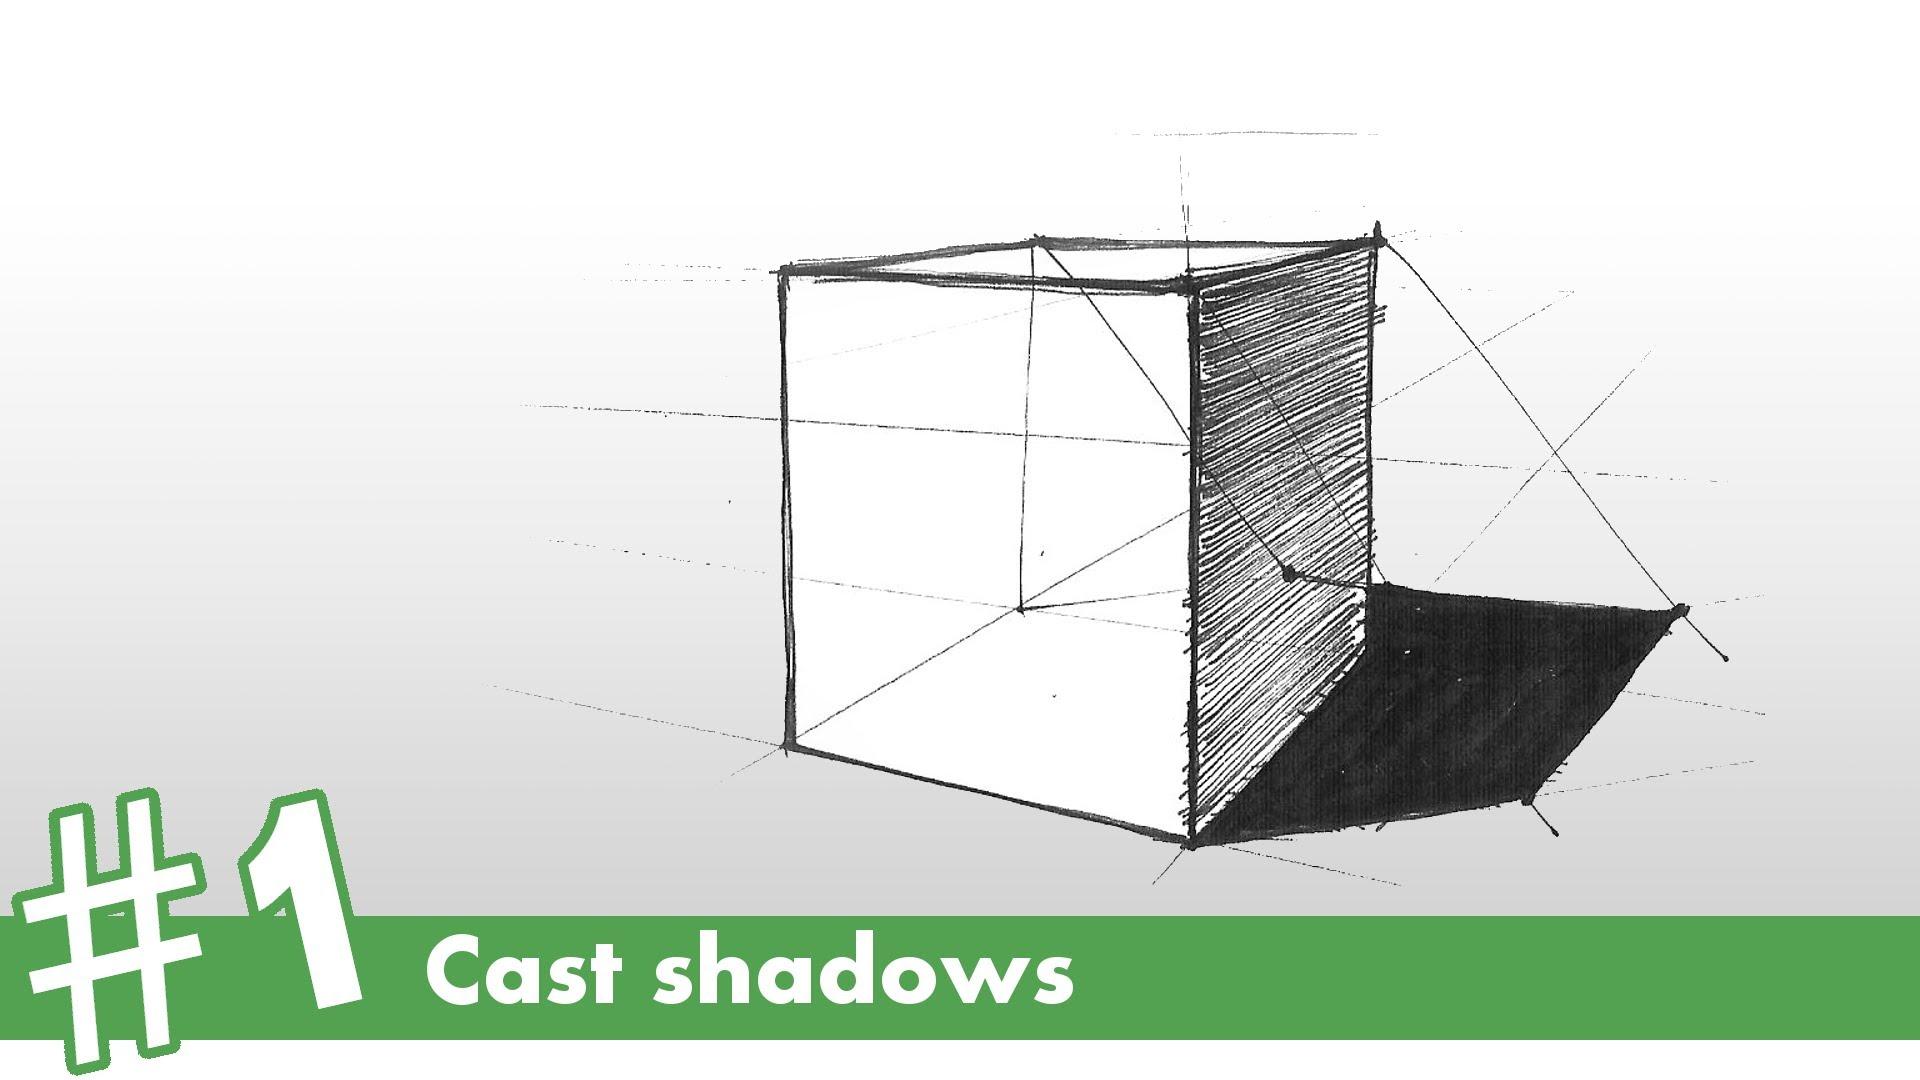 1920x1080 How To Draw Cast Shadows